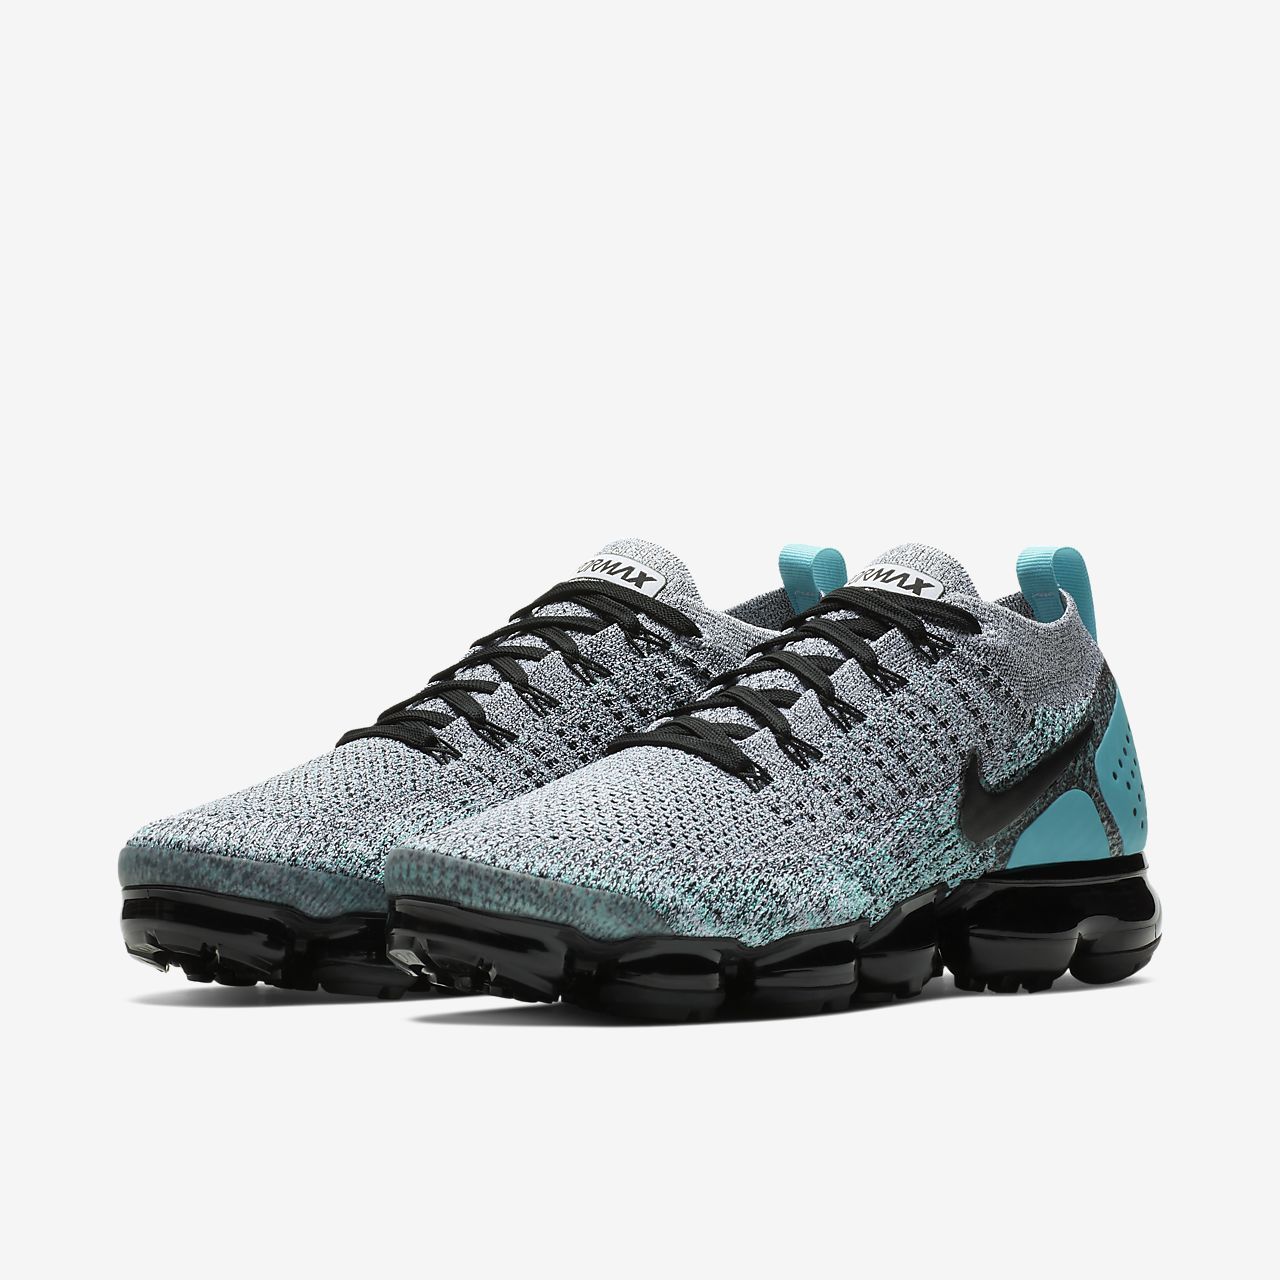 ... Nike Air VaporMax Flyknit 2 Men's Running Shoe